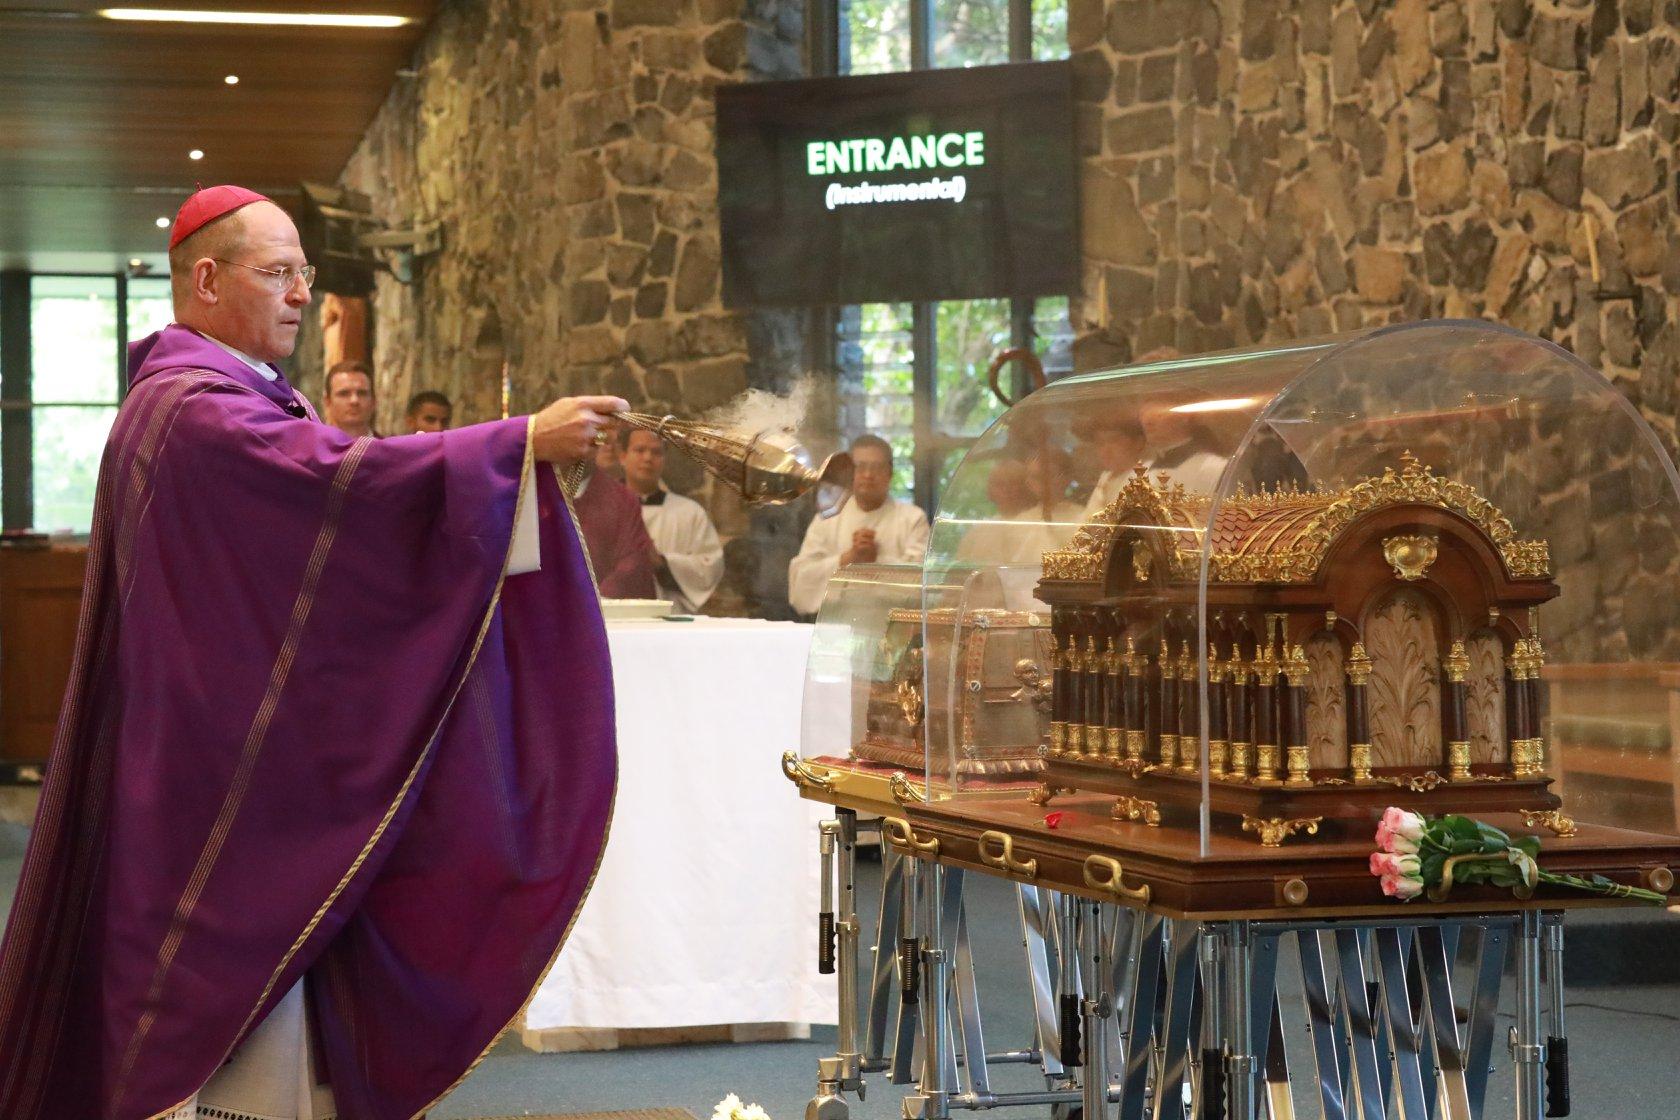 Bishop Incensing Relics